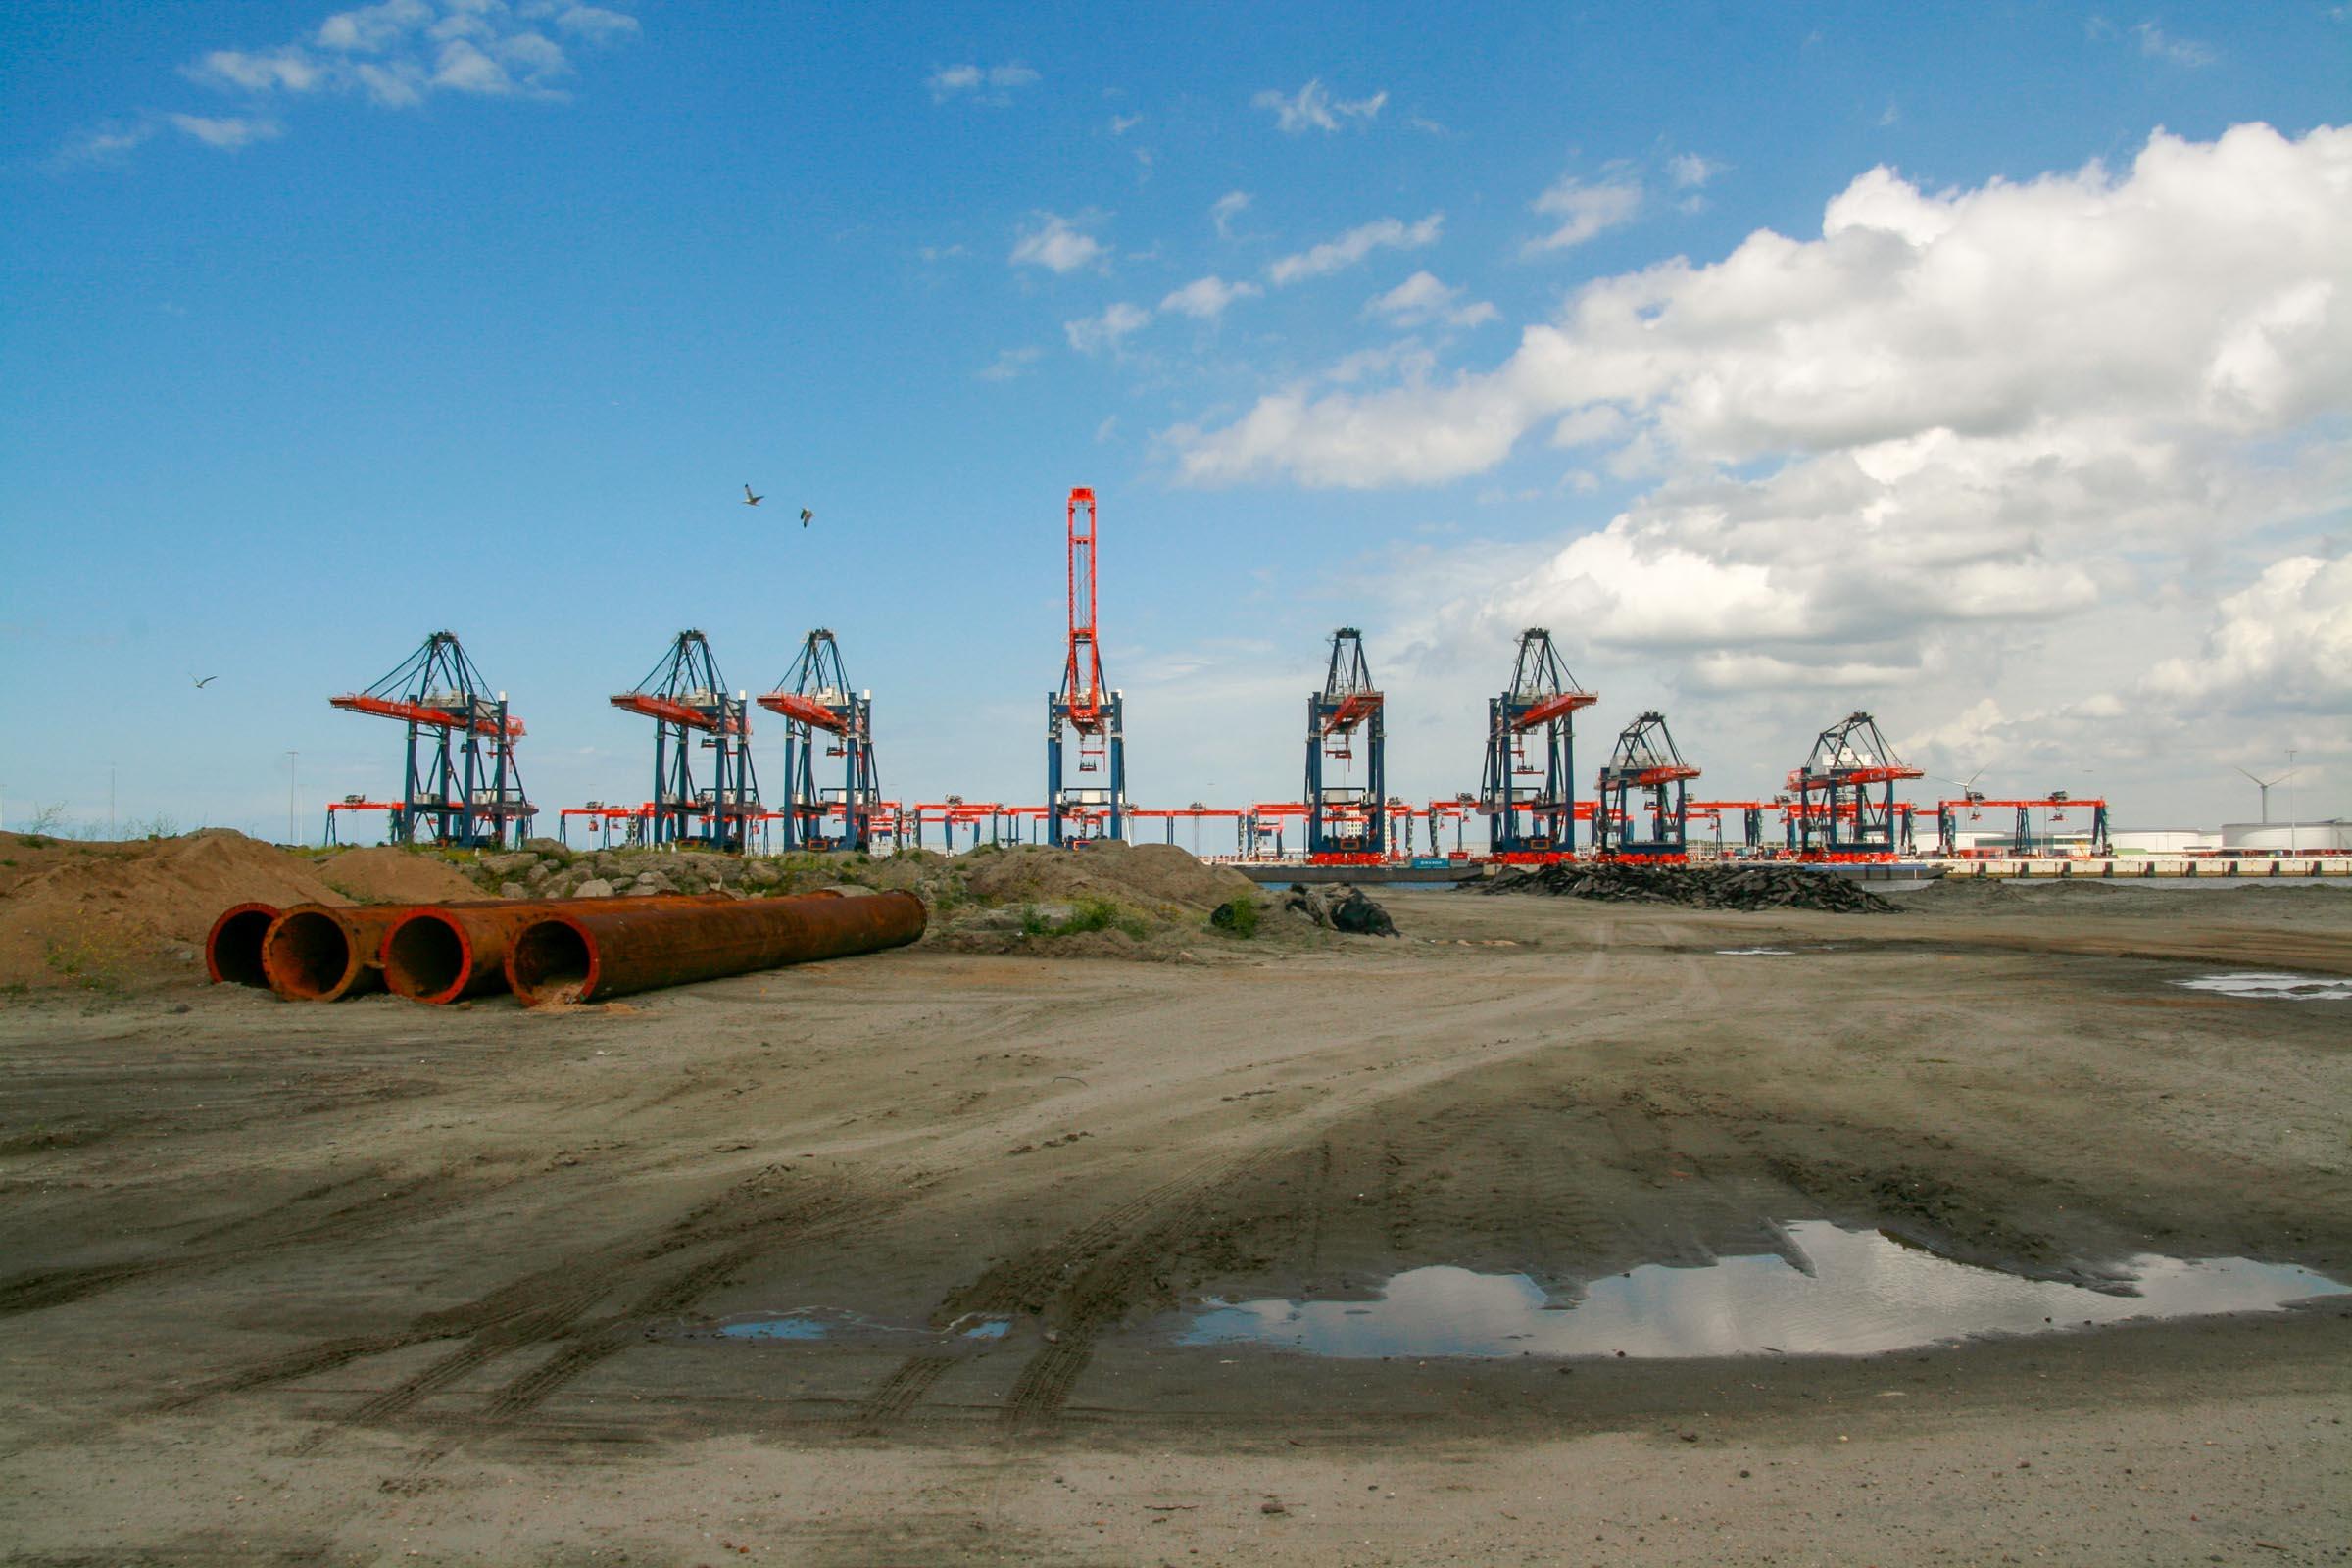 image from Themadag fotograferen op de Maasvlakte Rotterdam